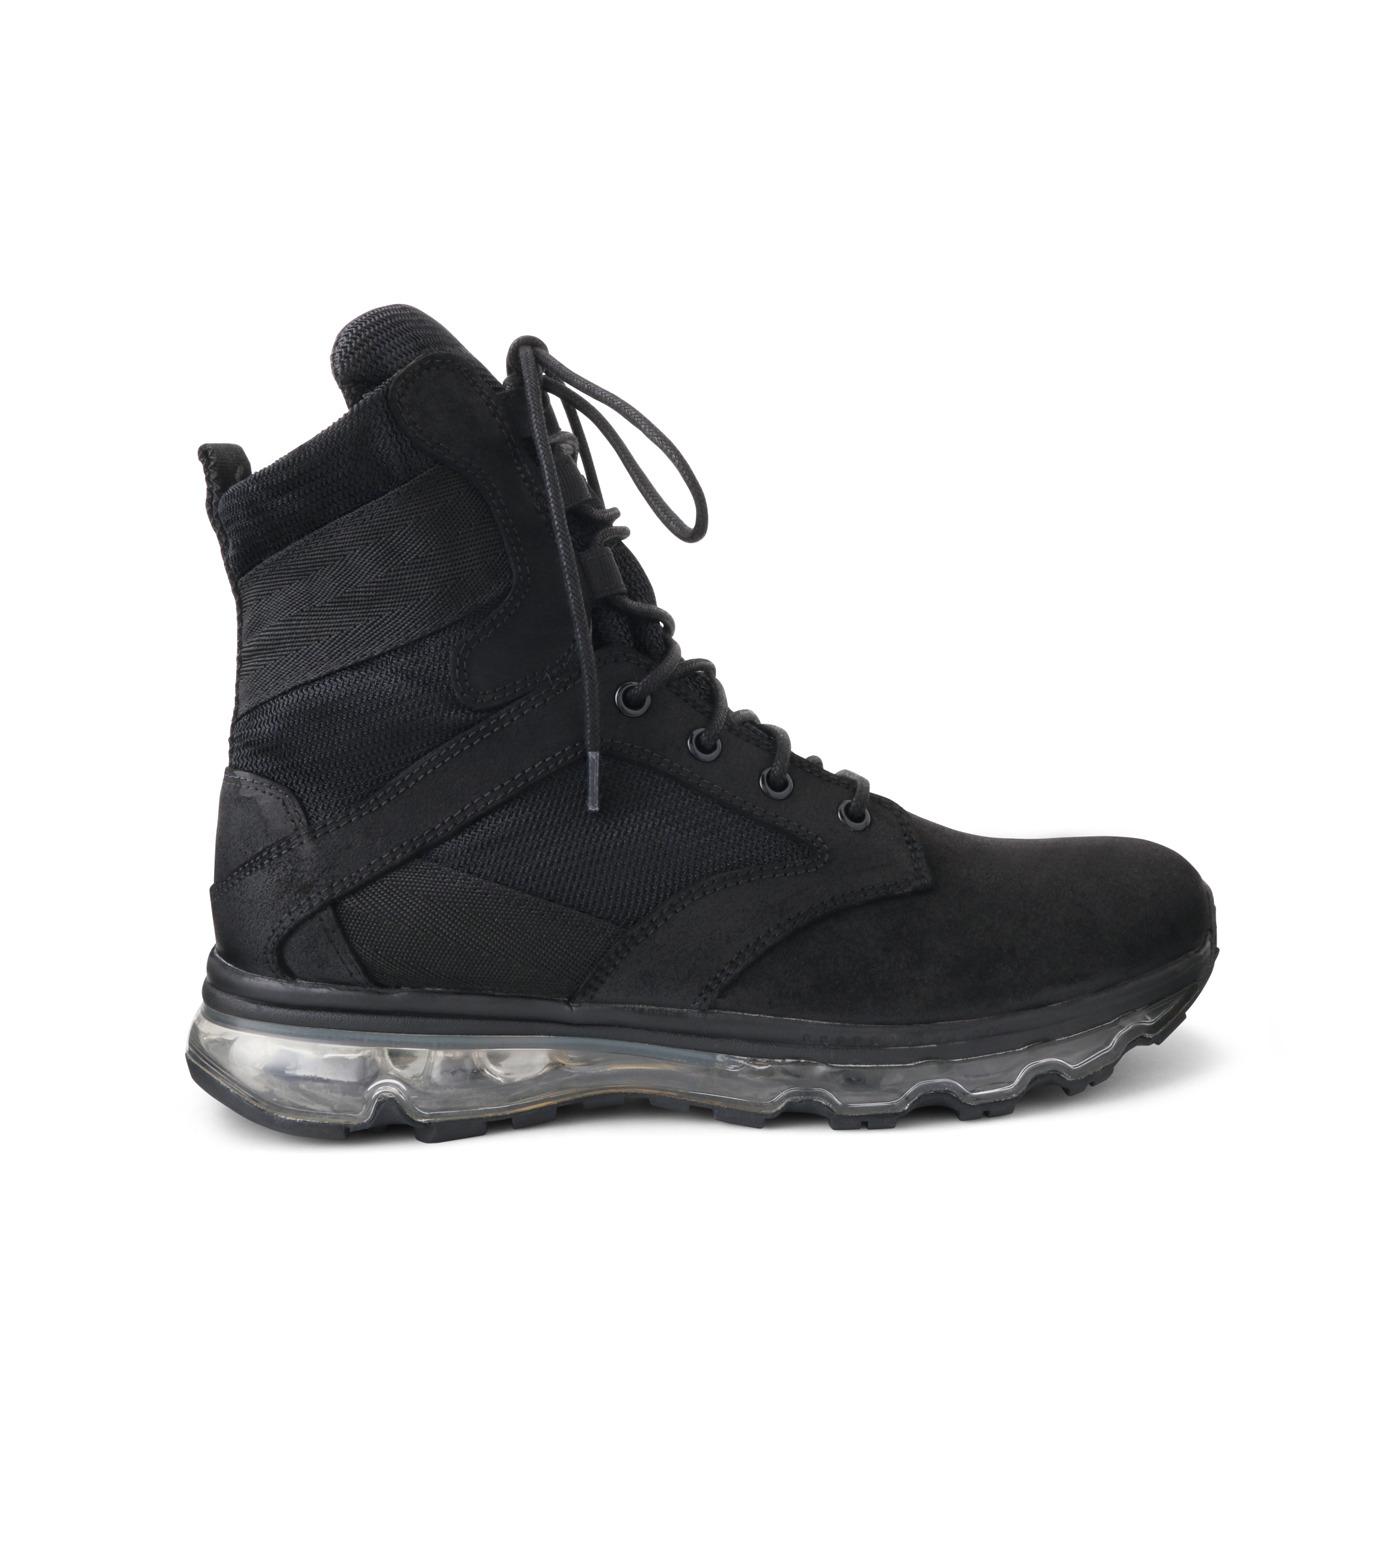 TOMO & CO(トモ アンド シーオー)のTM-SHOE-0022-BLACK(シューズ/shoes)-TM-SHOE-0022-13 拡大詳細画像1